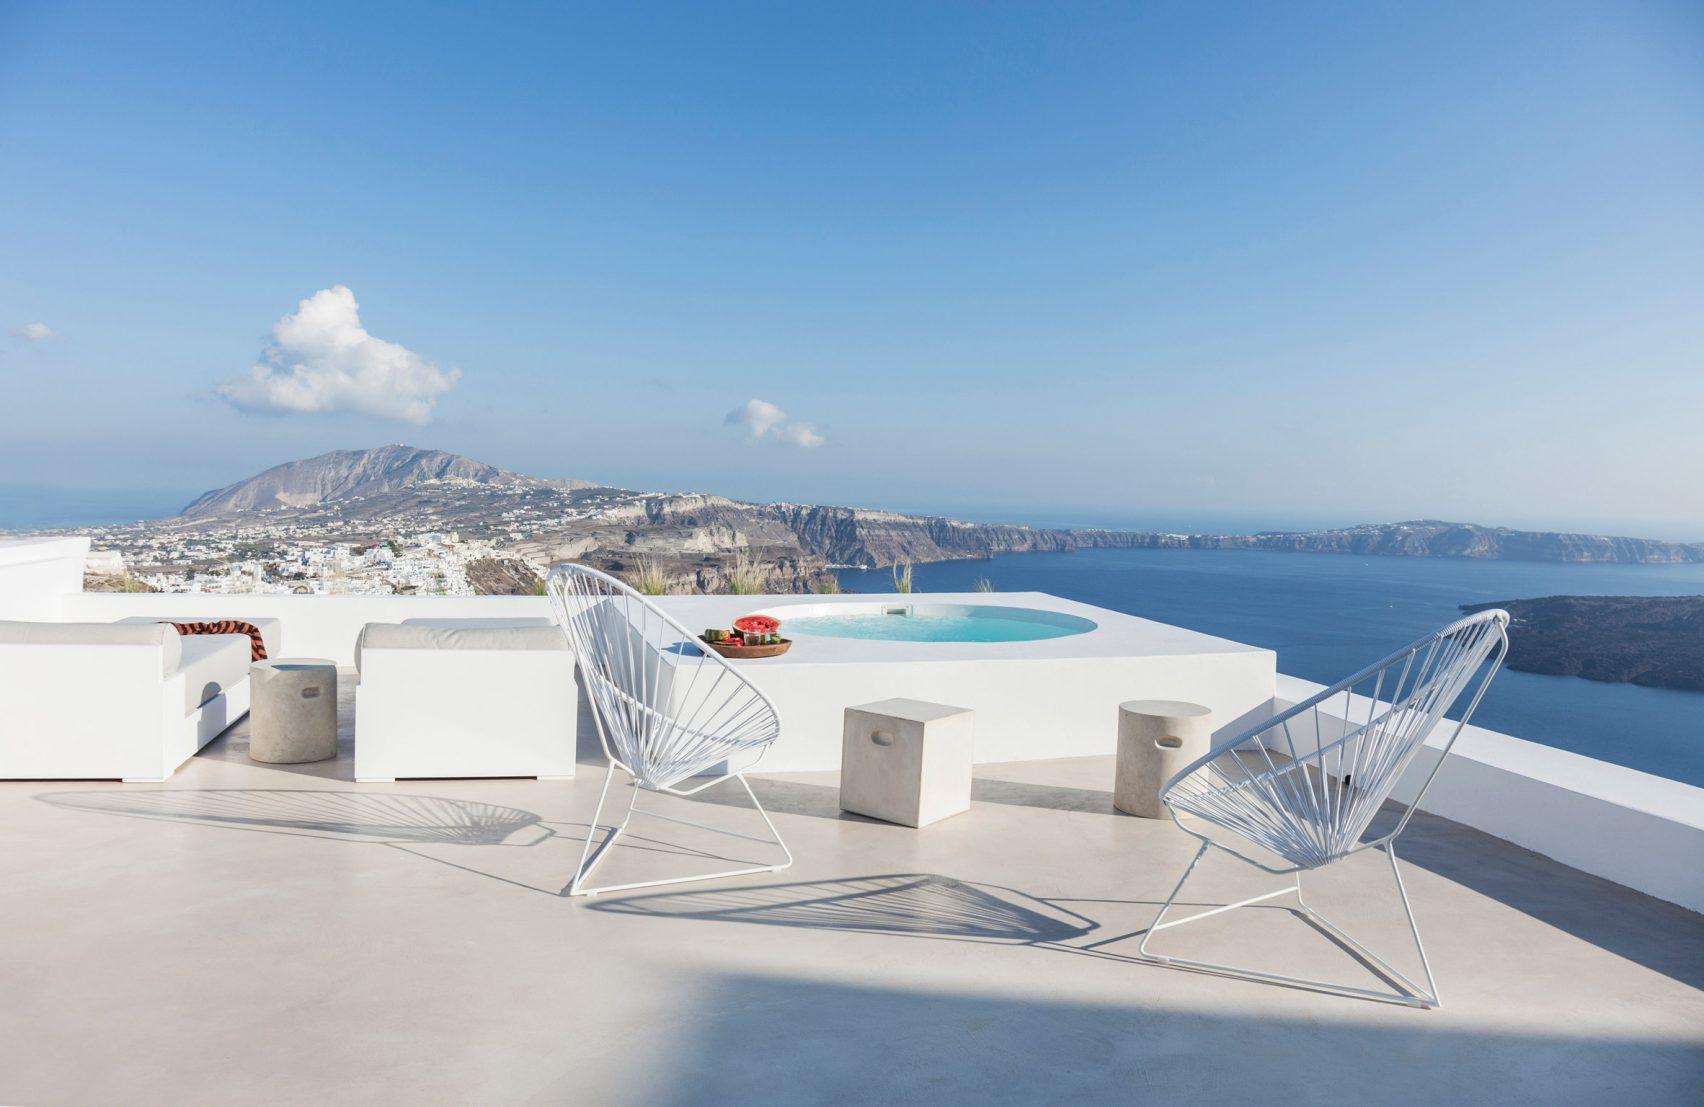 summer-residence-santorini-kapsimalis-architects-greece-architecture_dezeen_2364_col_9-1704x1107